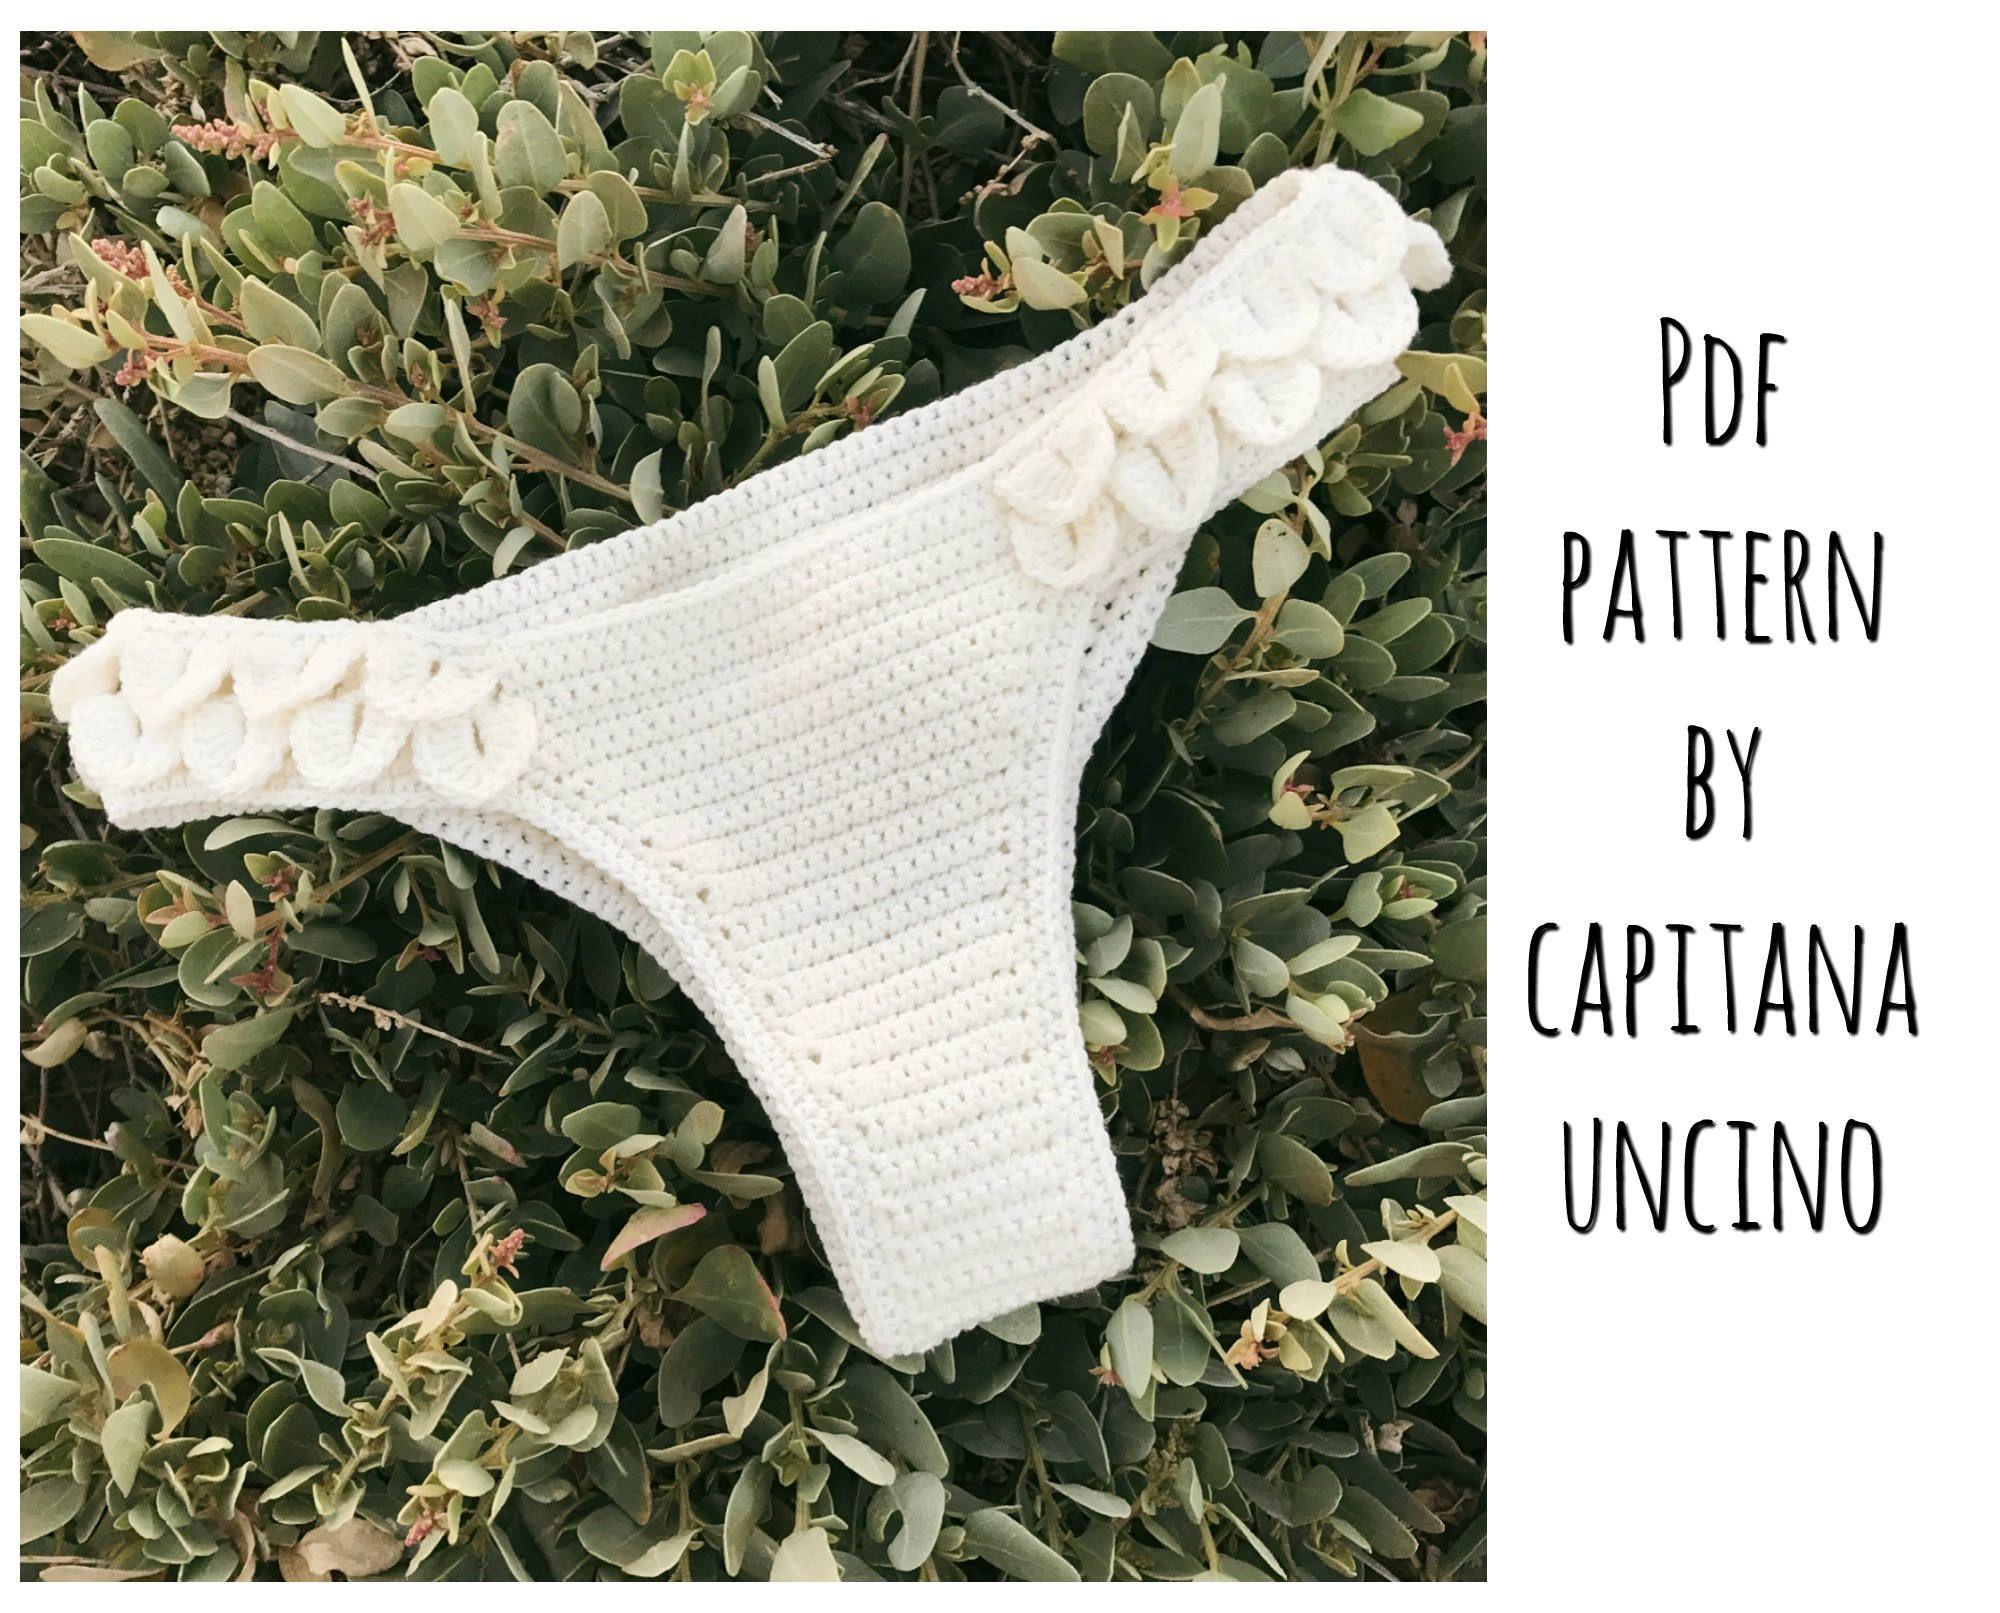 PDF-file for Crochet PATTERN Ariella Brasilian Bikini Bottom, Sizes XS-L, Cheeky by CapitanaUncino on Etsy